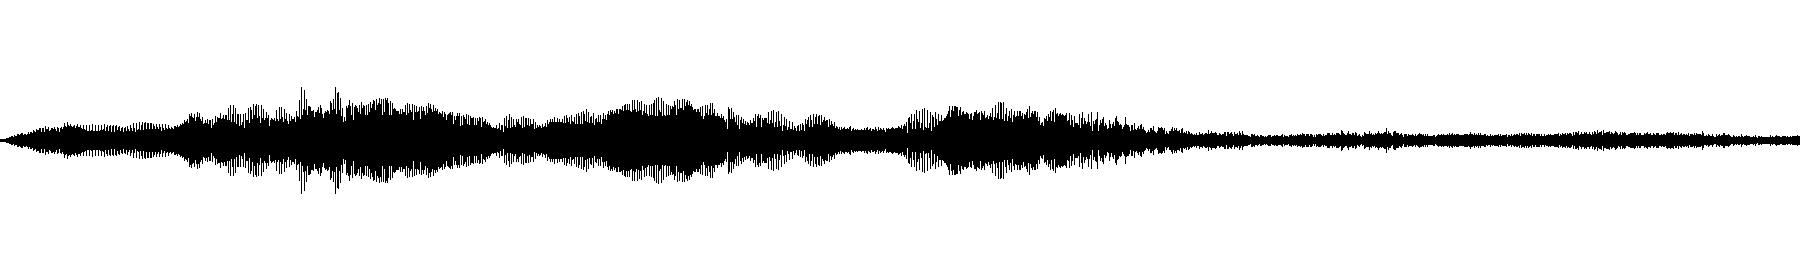 dual voice naa naa